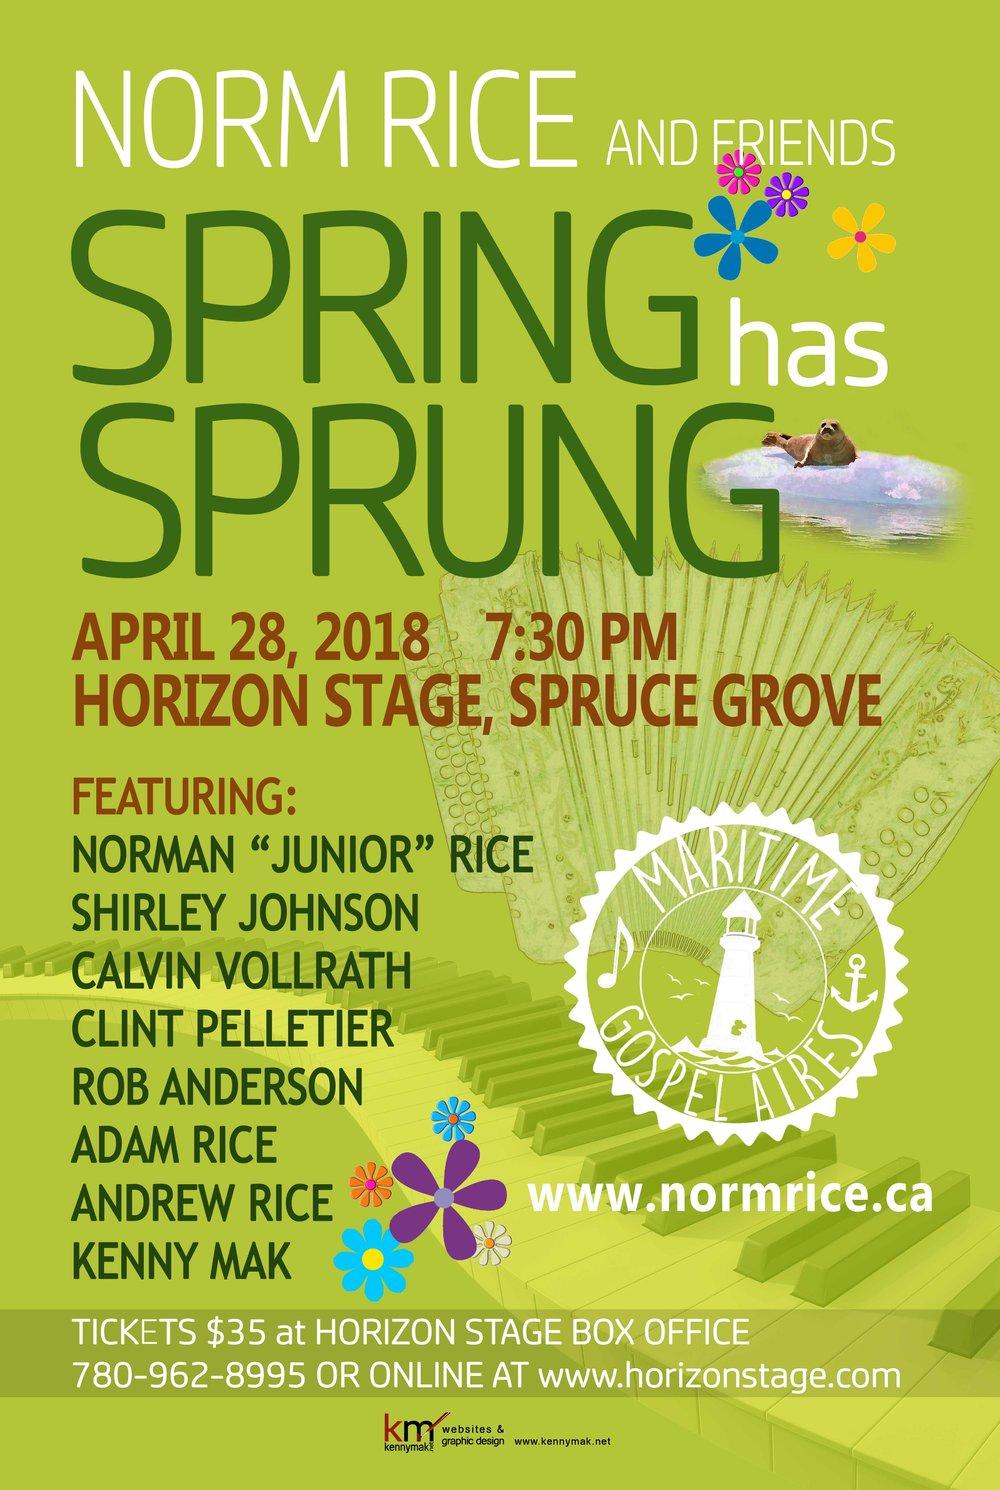 Spring has Sprung Calvin Vollrath, Clint Pellertier